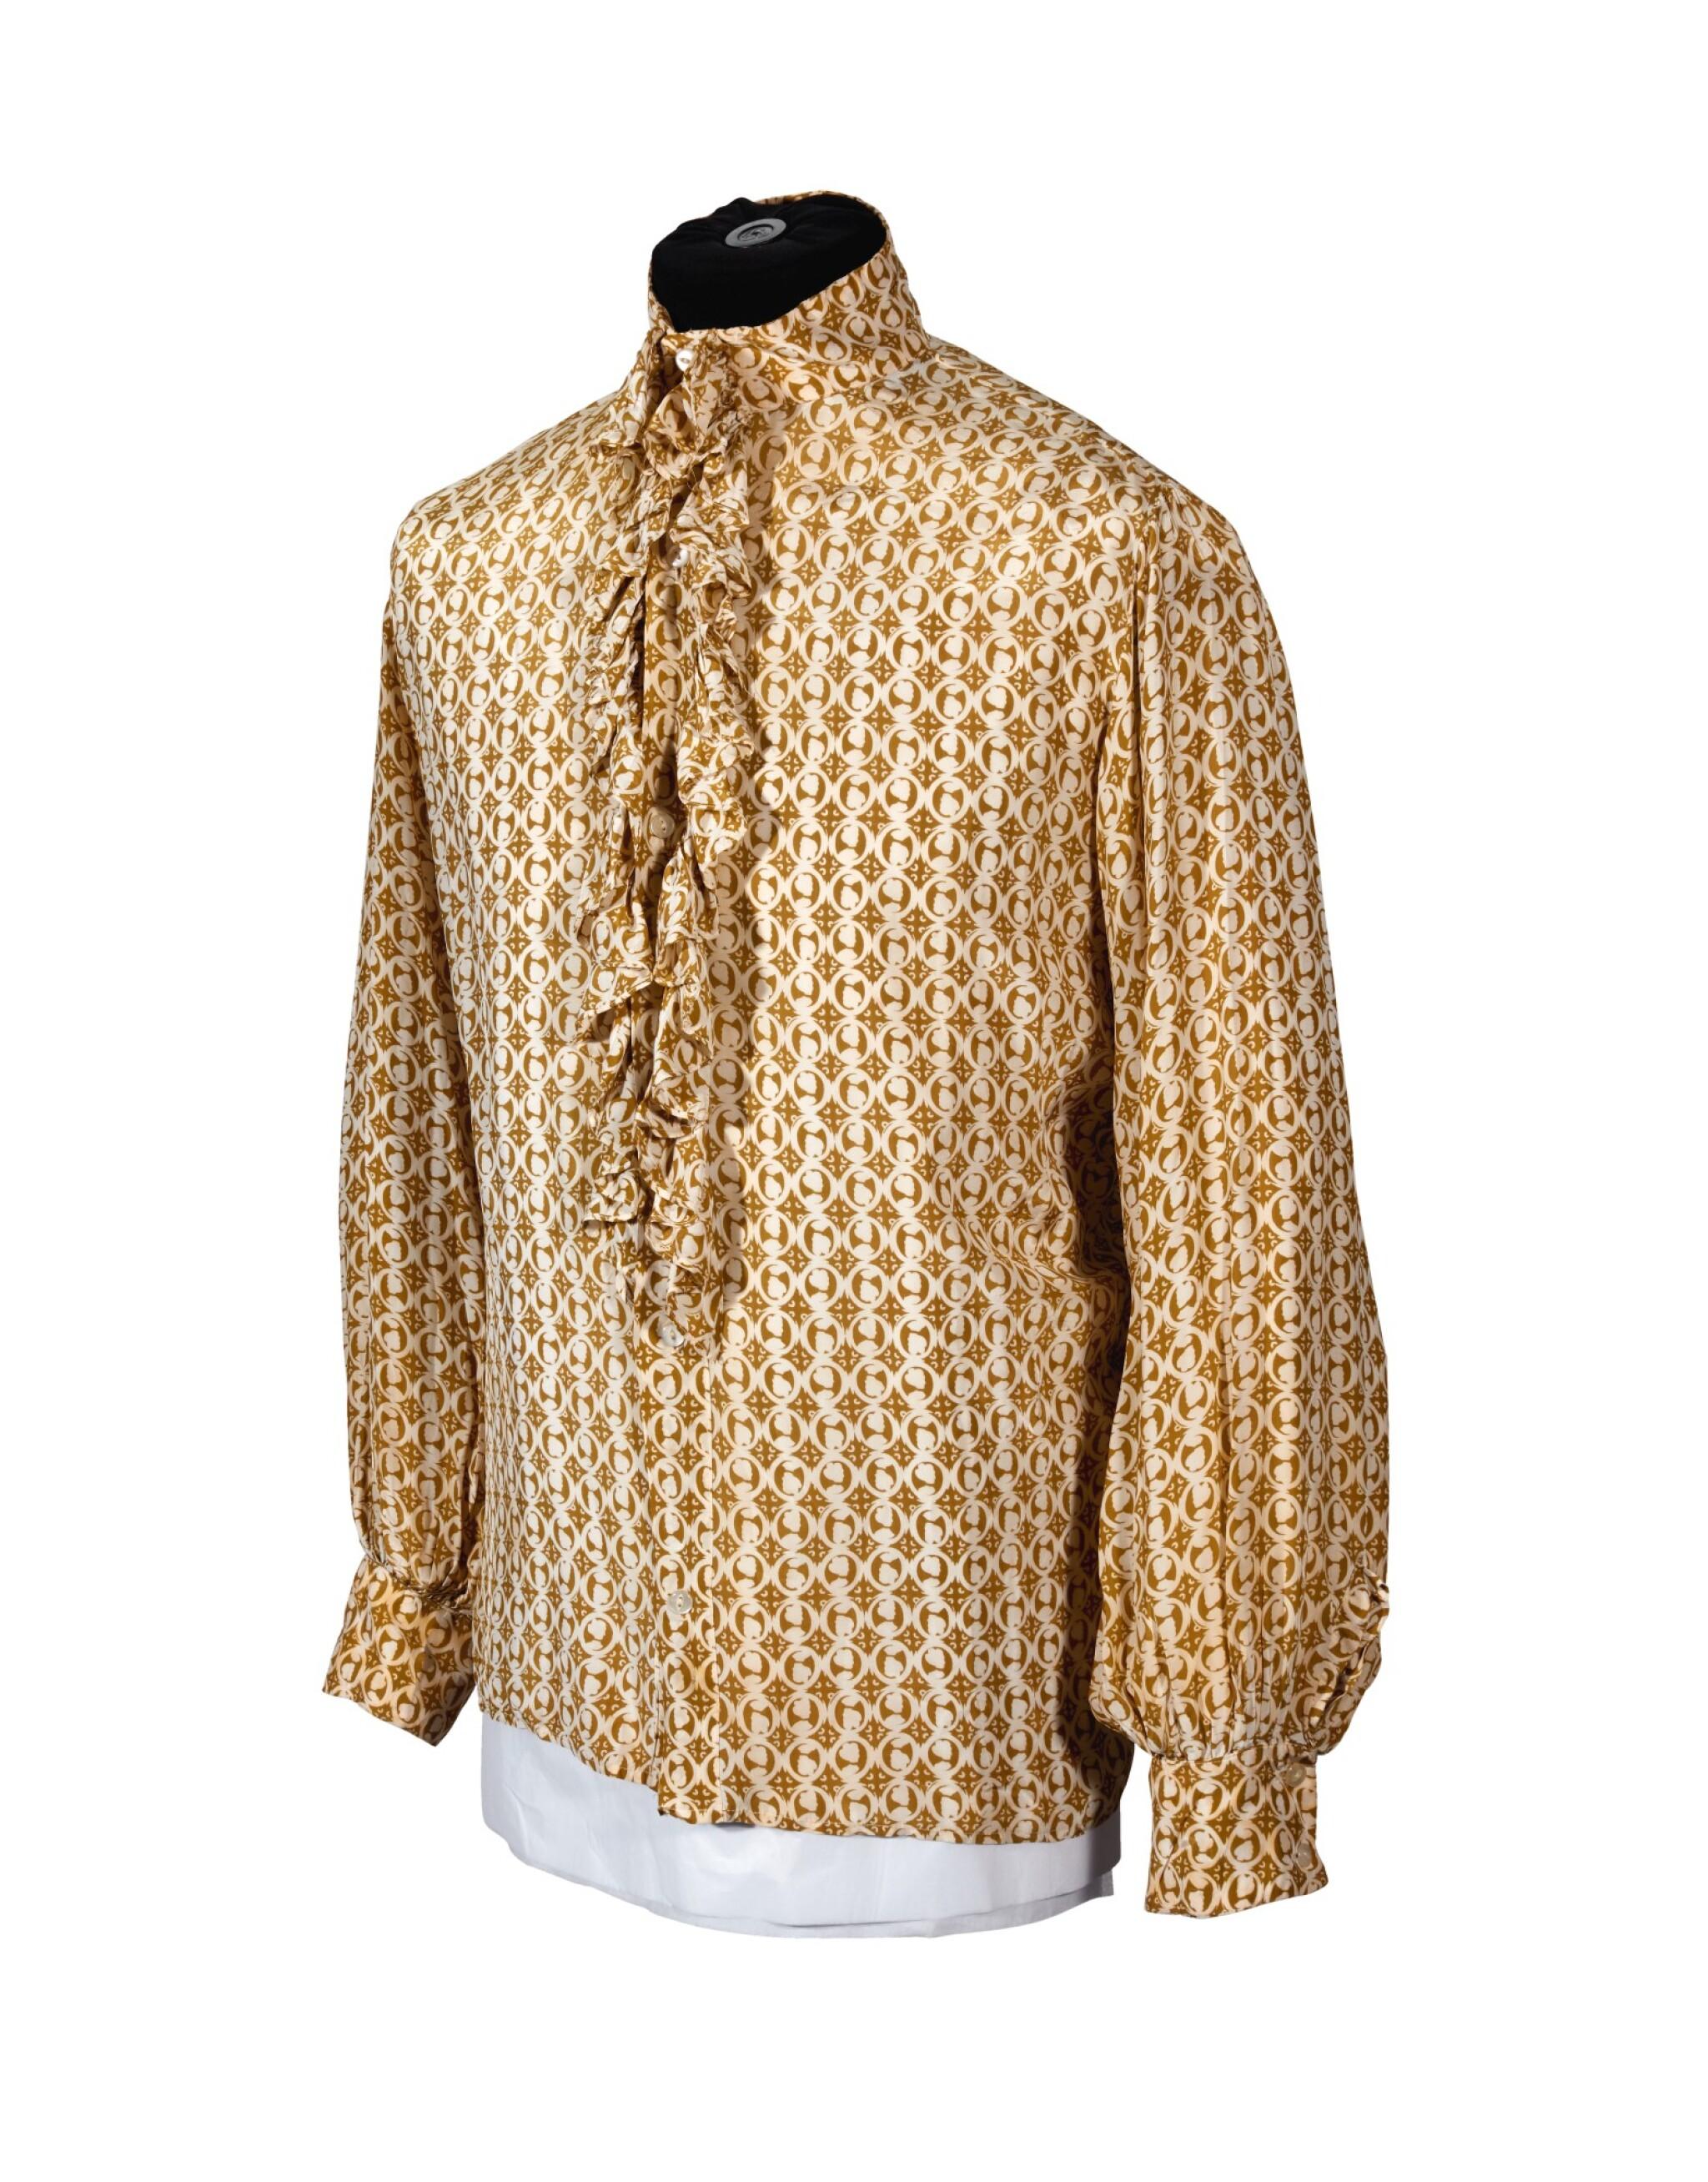 RINGO STARR   Green-gold and cream ruffle collar shirt, unlabelled